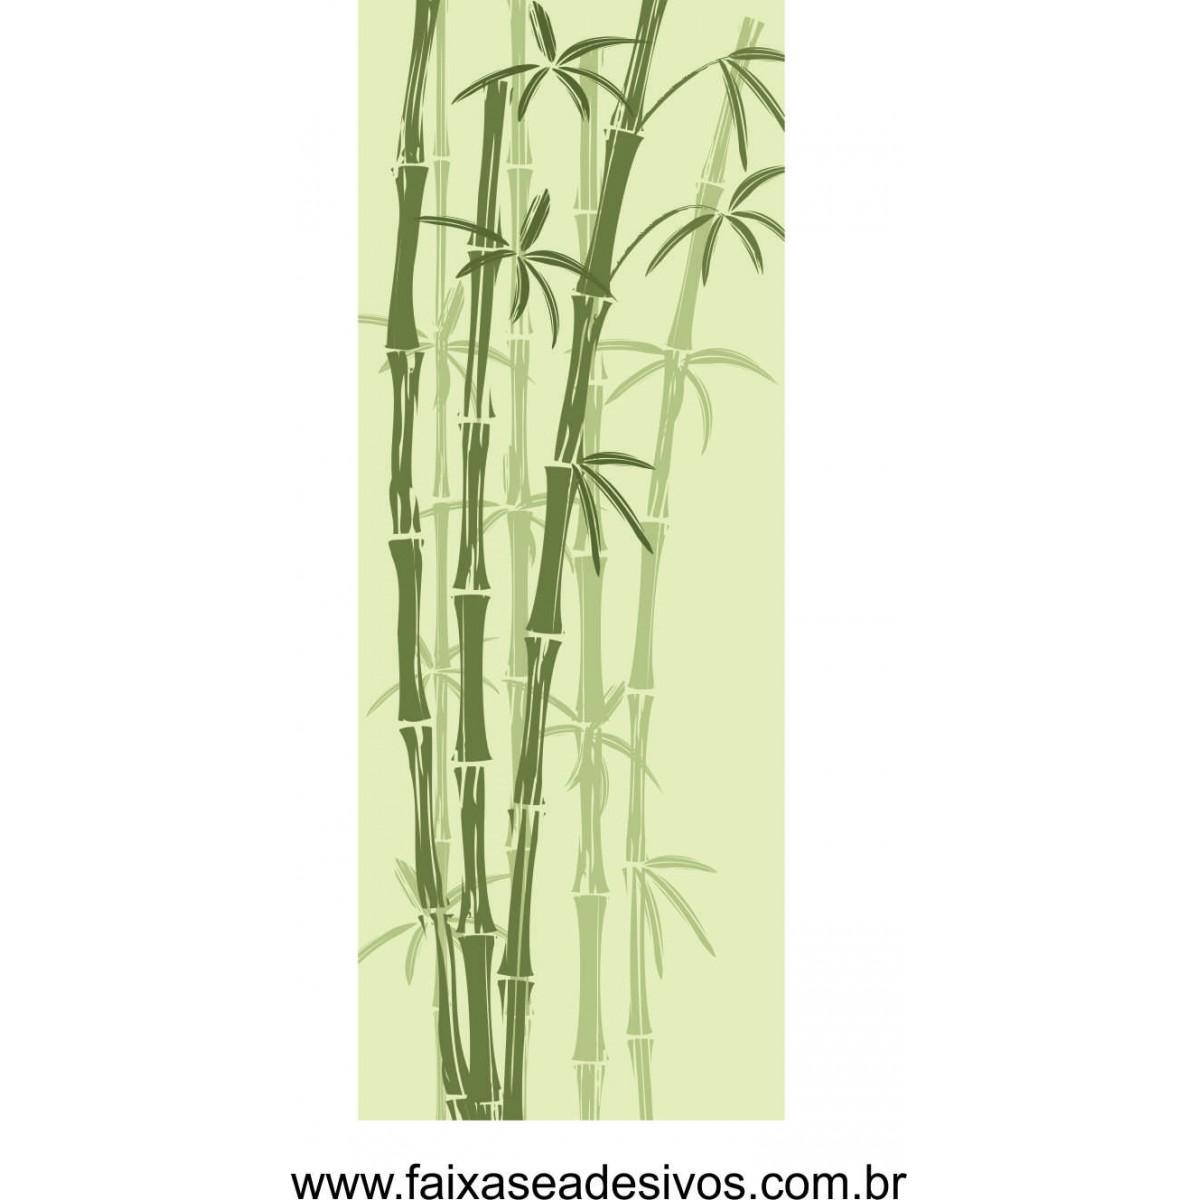 #889B30 011 Adesivo Jateado para vidro Bamboo 210x90cm FAC Signs  208 Janelas De Vidro Onde Comprar